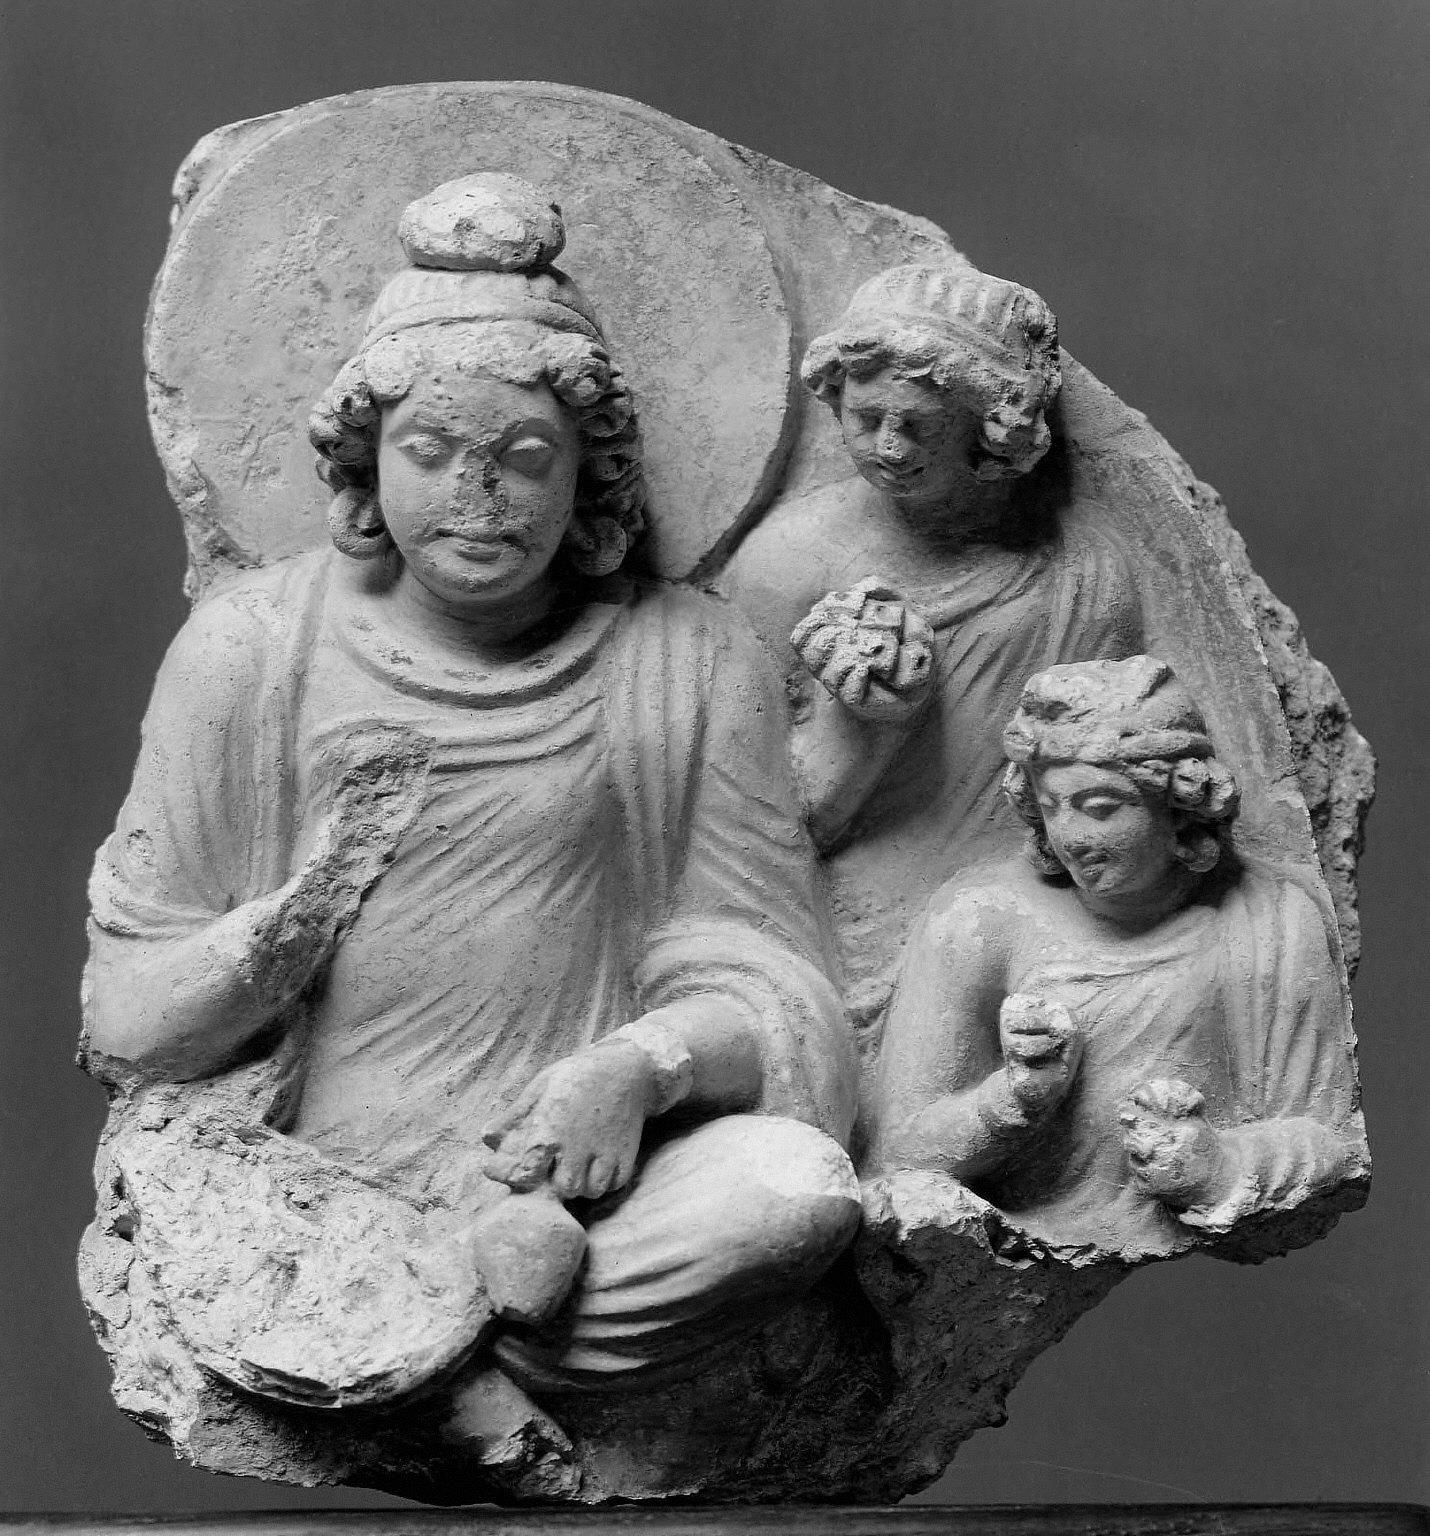 Bodhisattva Maitreya and Attendants